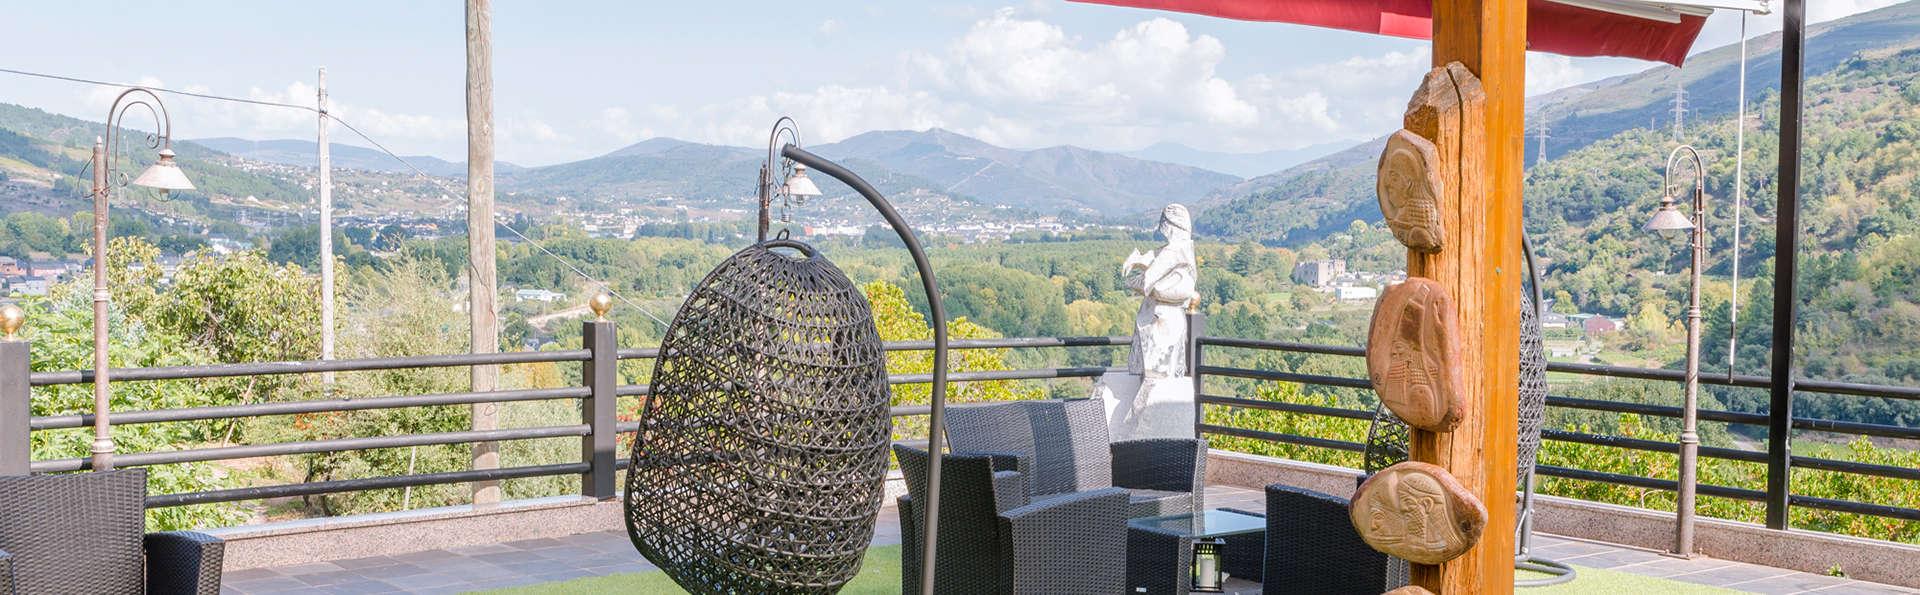 Complejo Hostelero Paladium - EDIT_terrace3.jpg